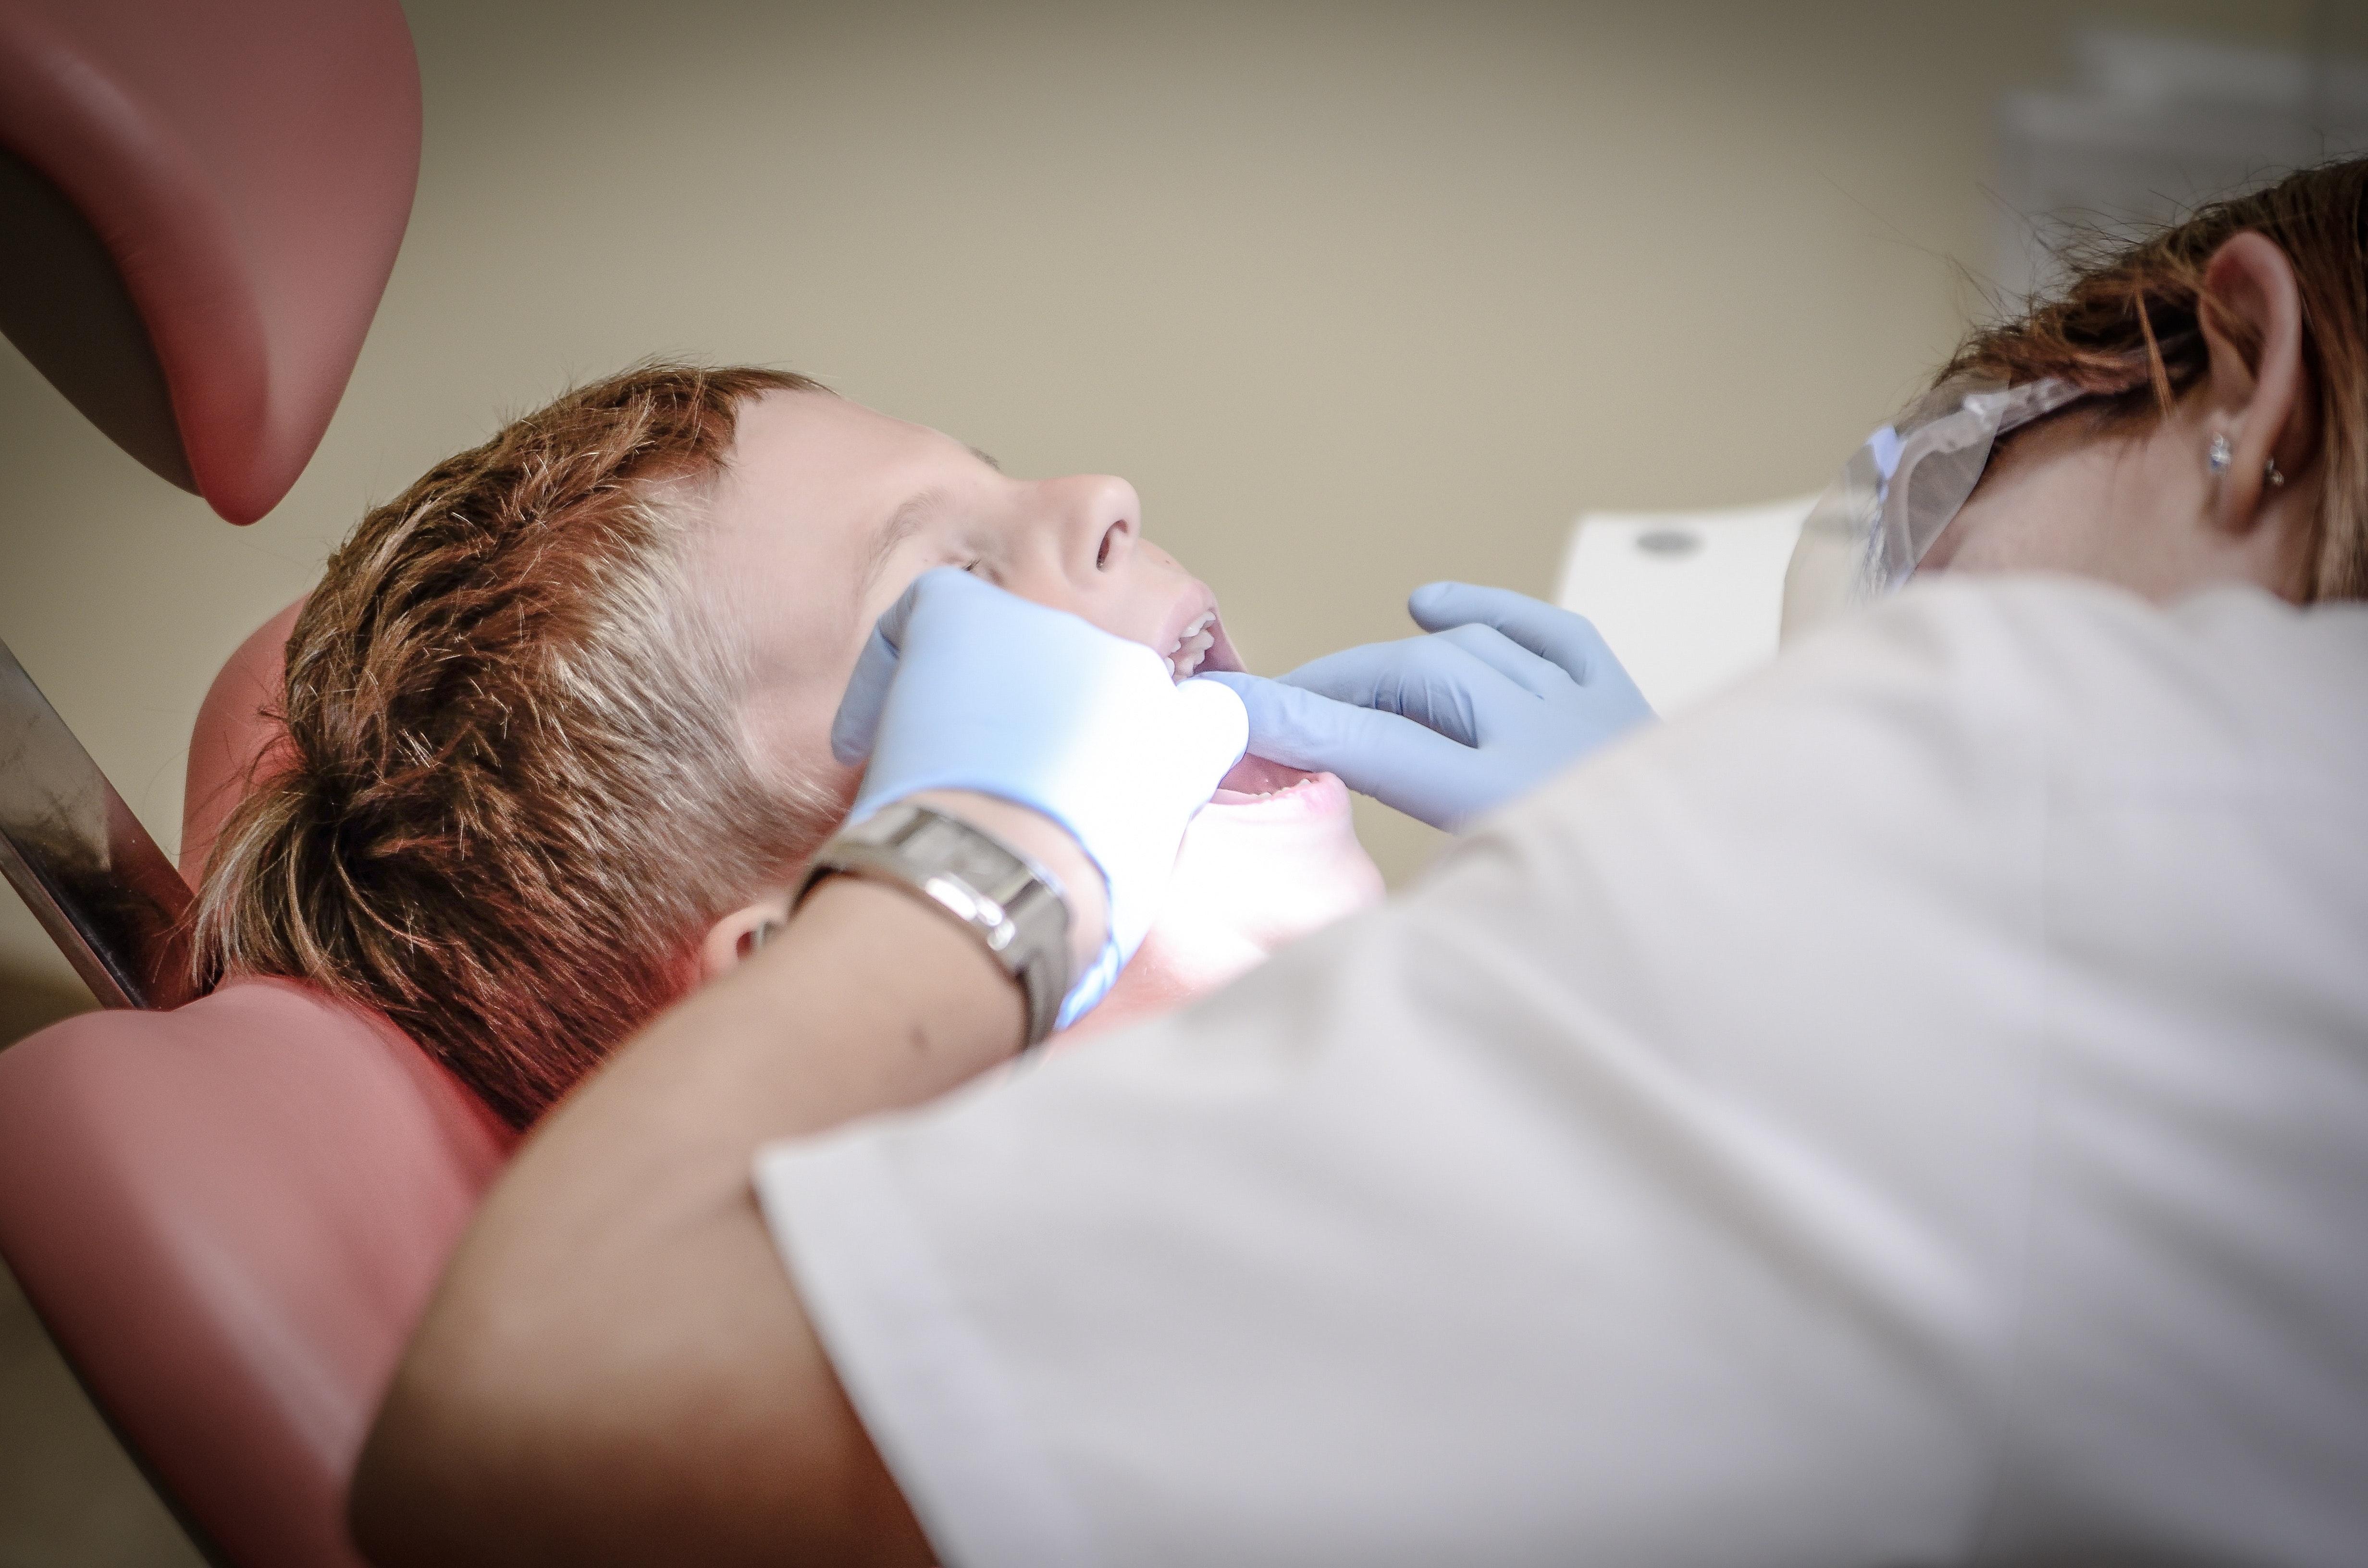 pain-armchair-dentist-suffering-52527